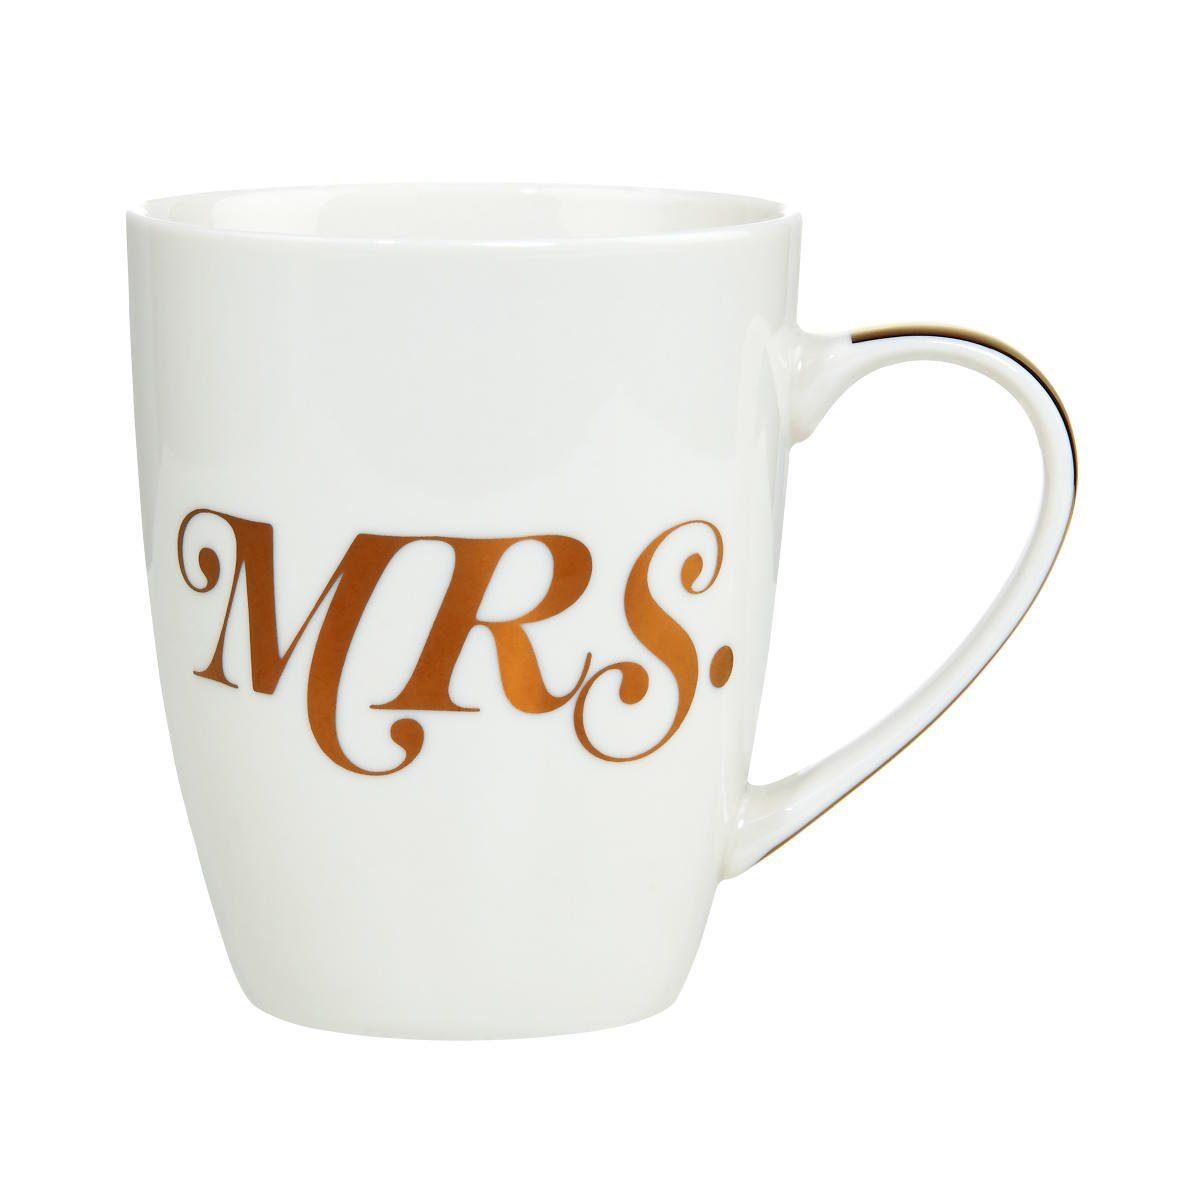 BUTLERS MR.& MRS. »Tasse Mrs. mit goldenem Griff«